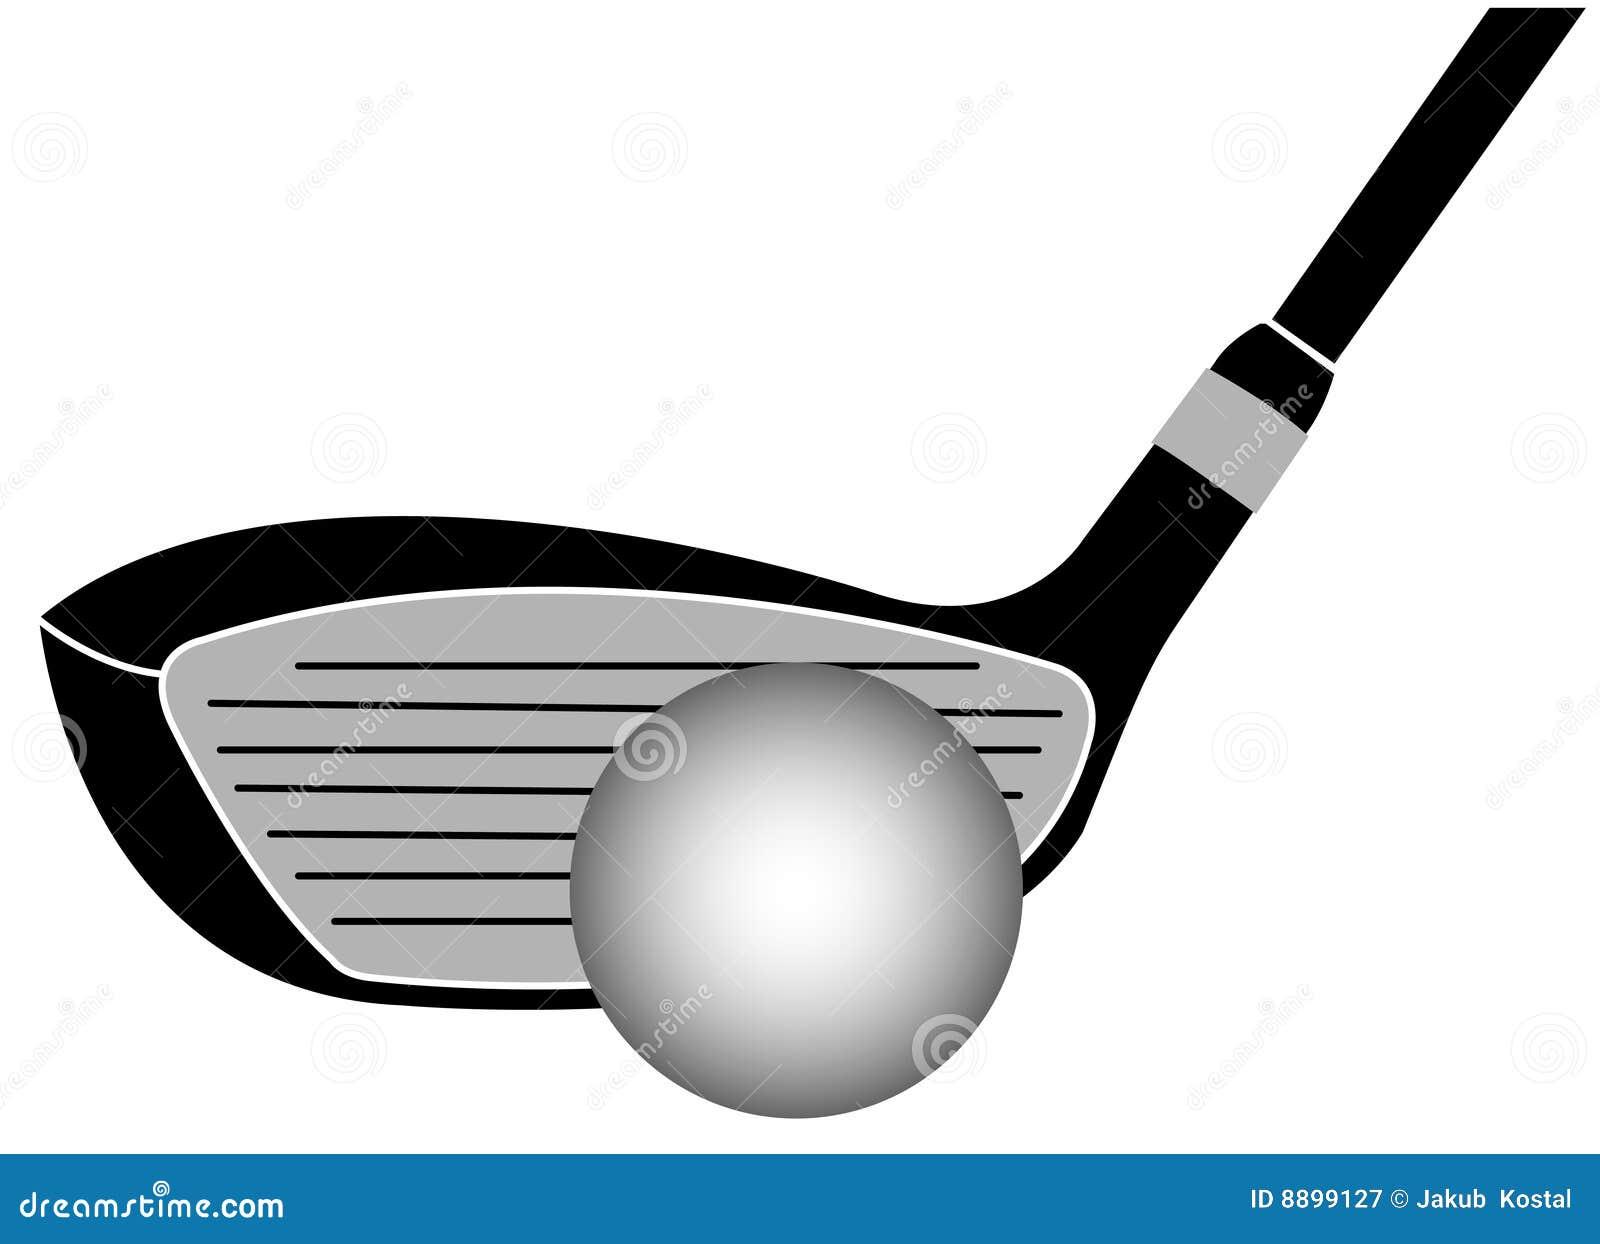 Royalty Free Stock Photography  Golf Club Iron Vector IllustrationGolf Club Iron